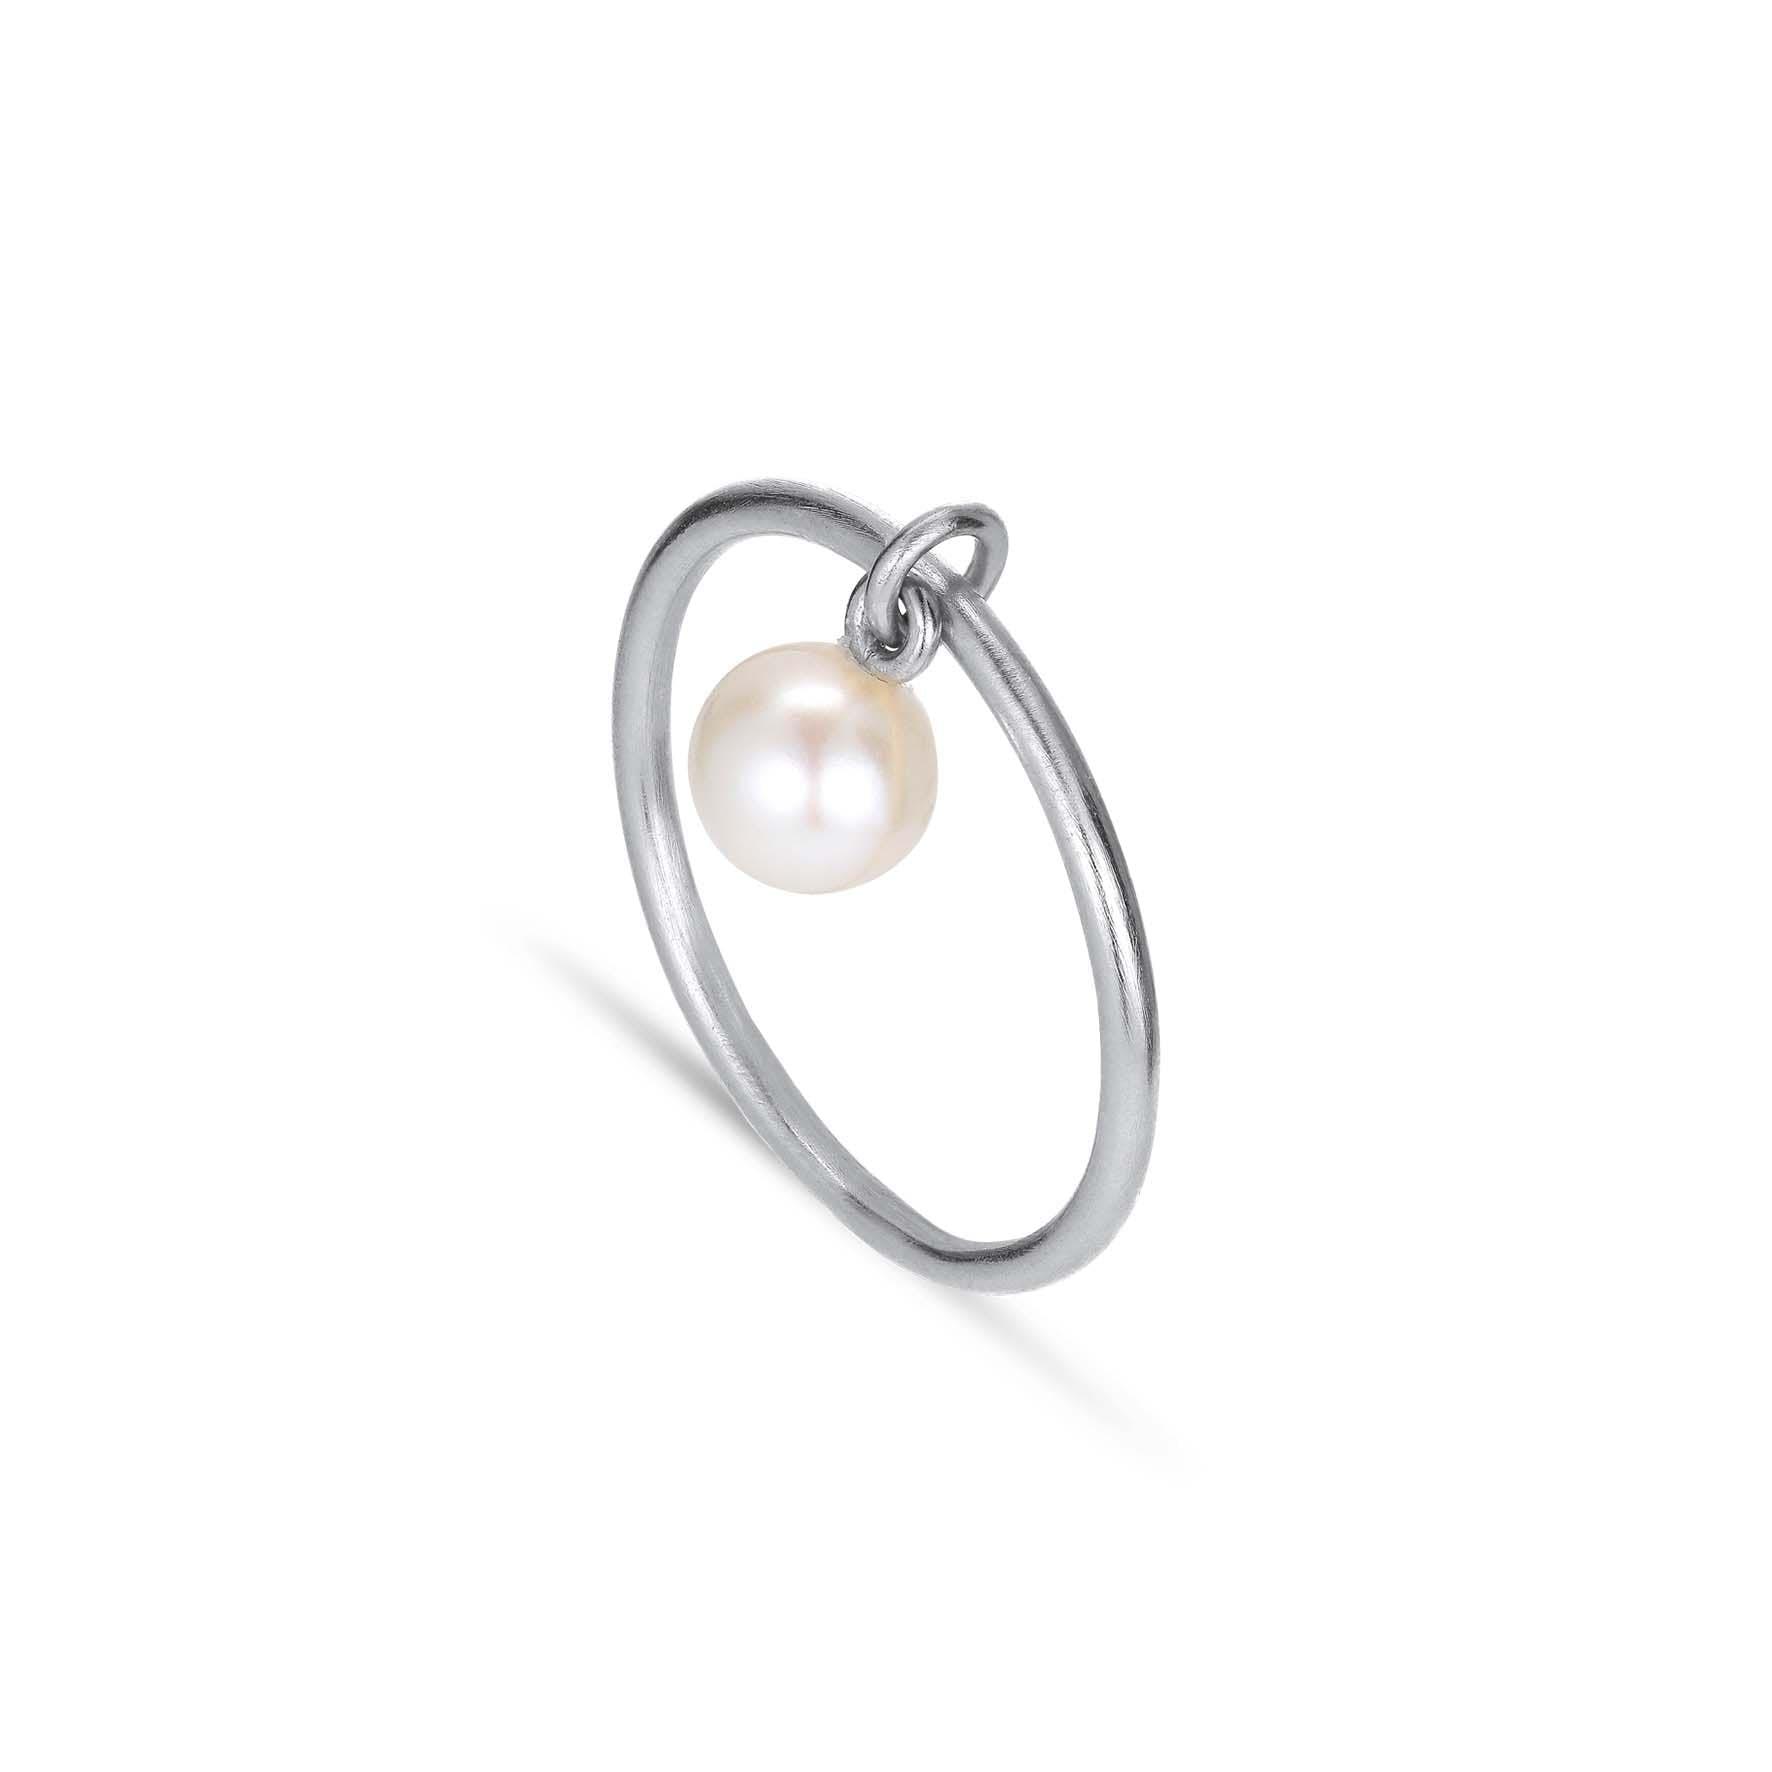 Row Pearl Ring von Jane Kønig in Silber Sterling 925